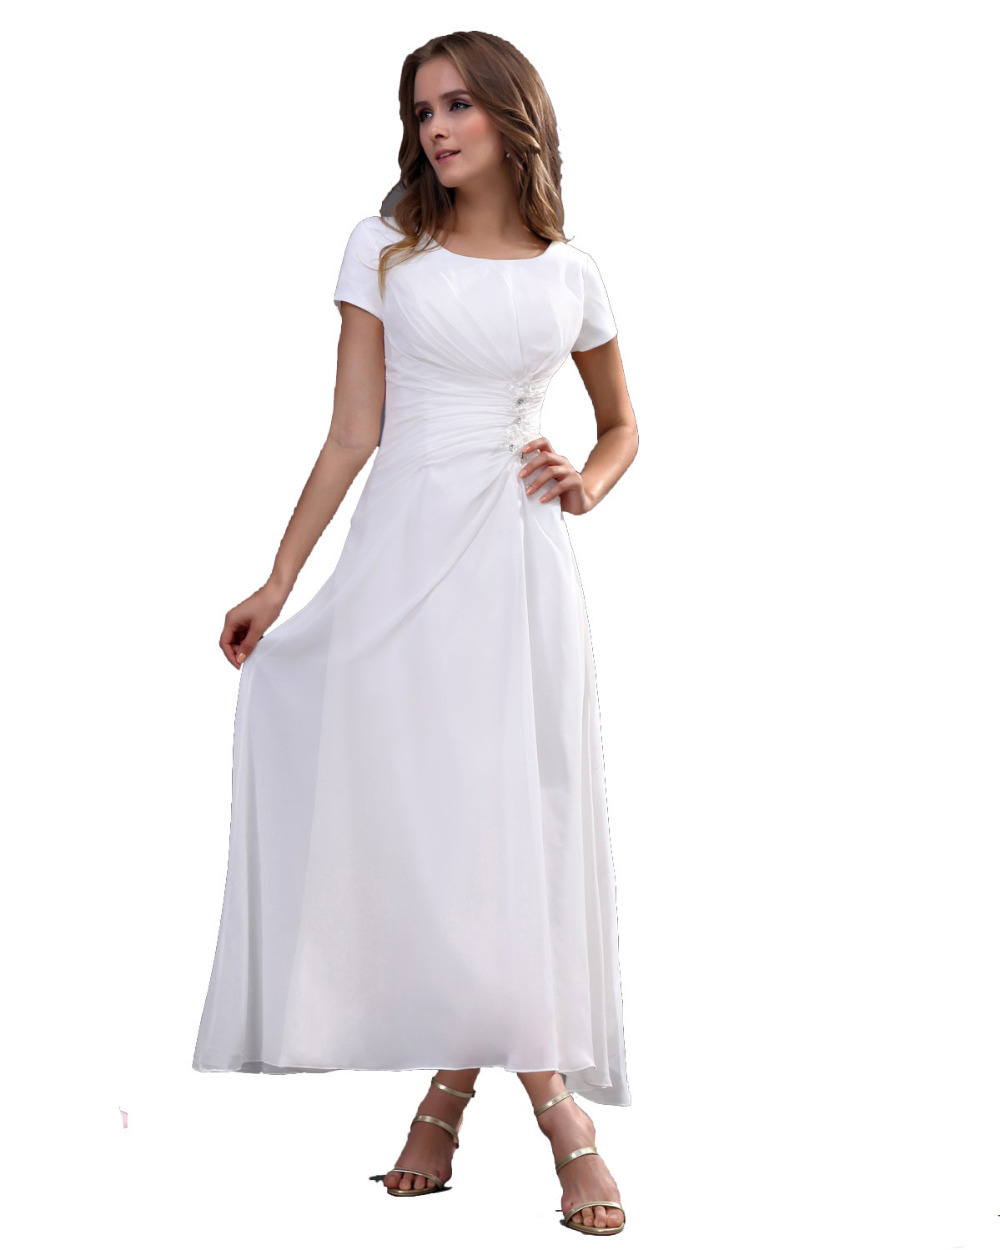 Simple Elegant Tea Length Chiffon Cap Sleeve Wedding: 2015-bridesmaid-dress-Tea-Length-white-Cap-sleeve-chiffon